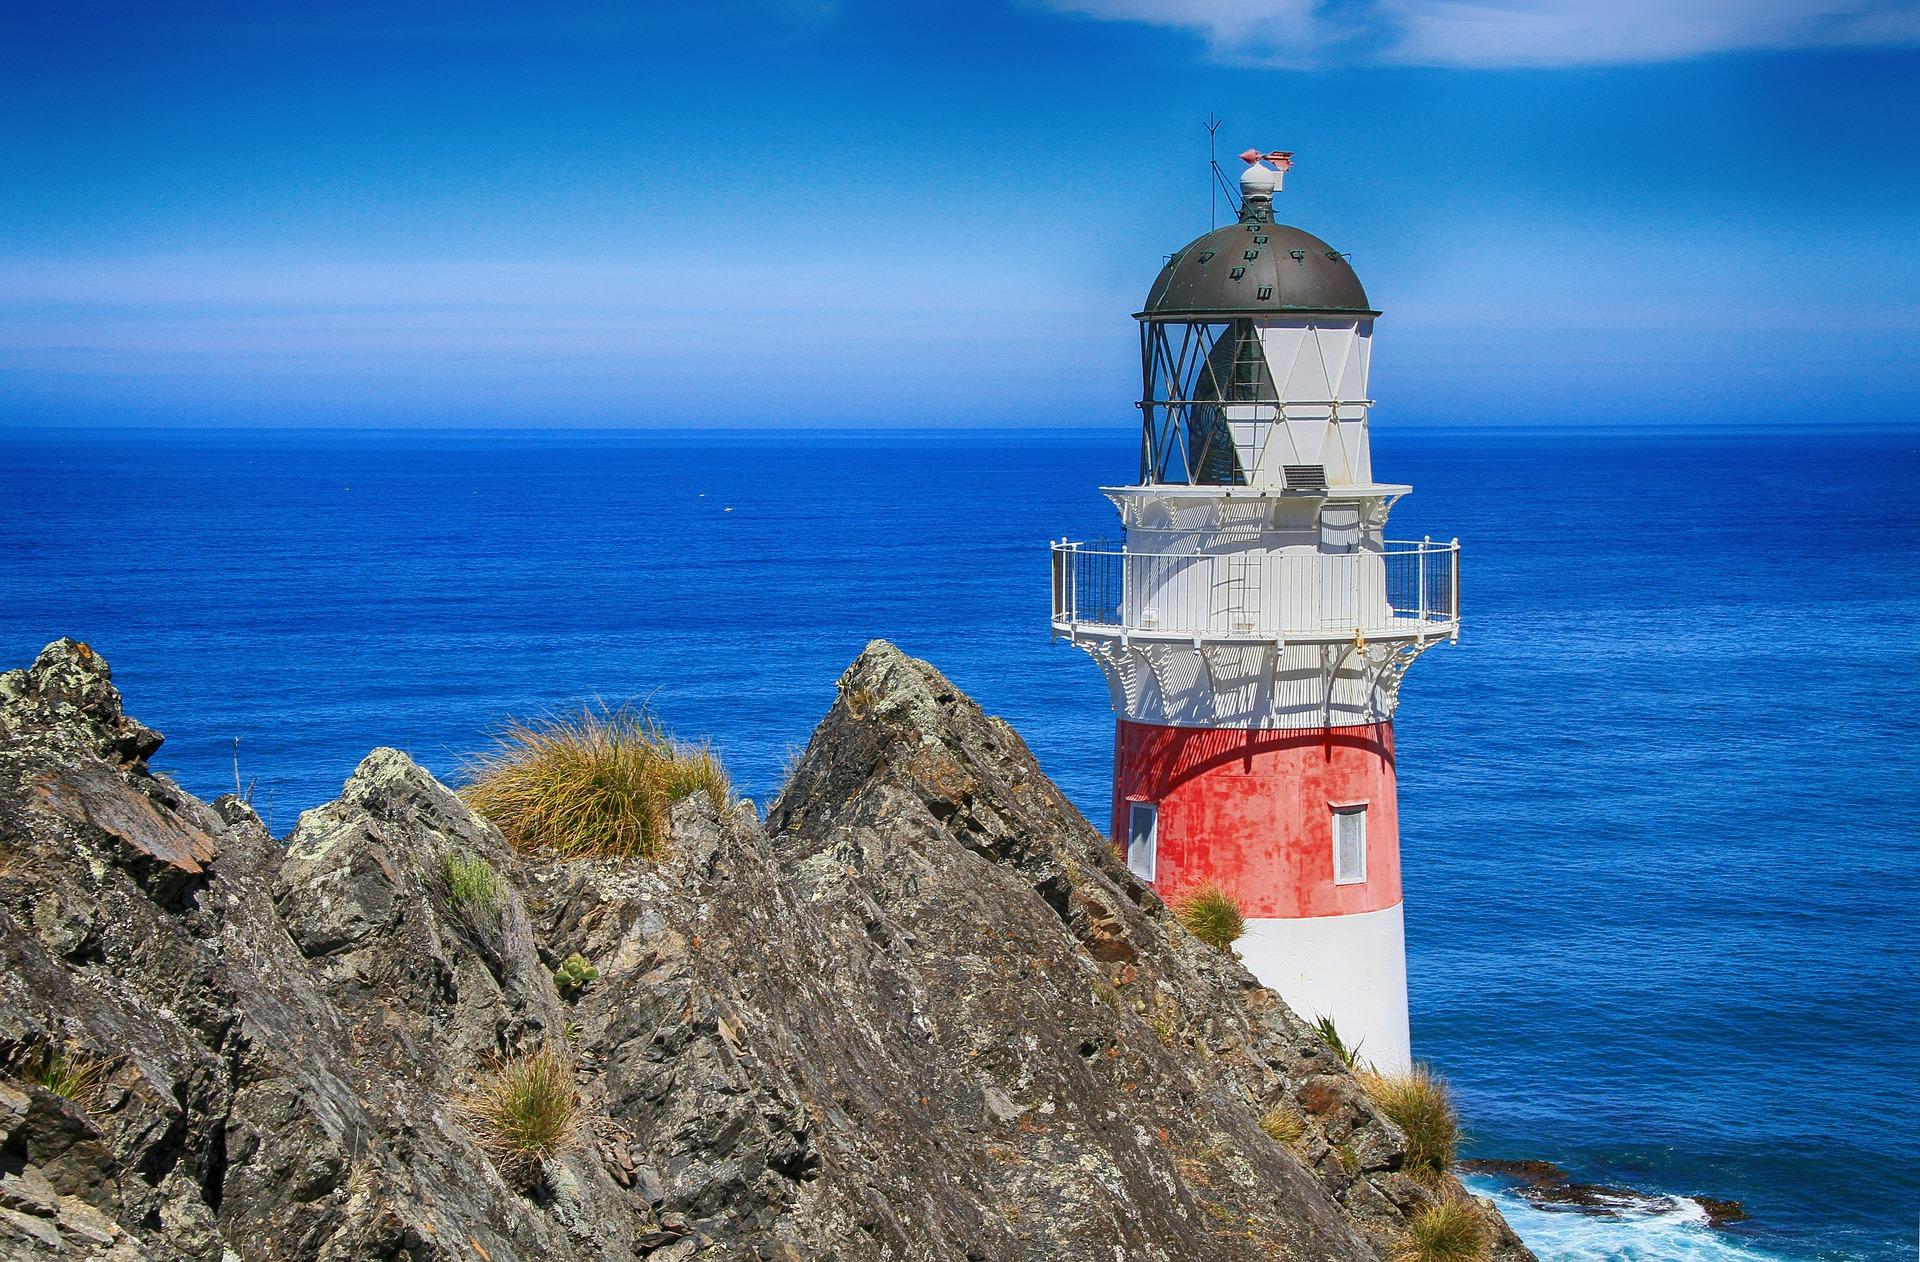 Tourism Advisory New Zealand_Tourism Destination_Must Visit Places in New Zealand 2021lighthouse-93487_1920